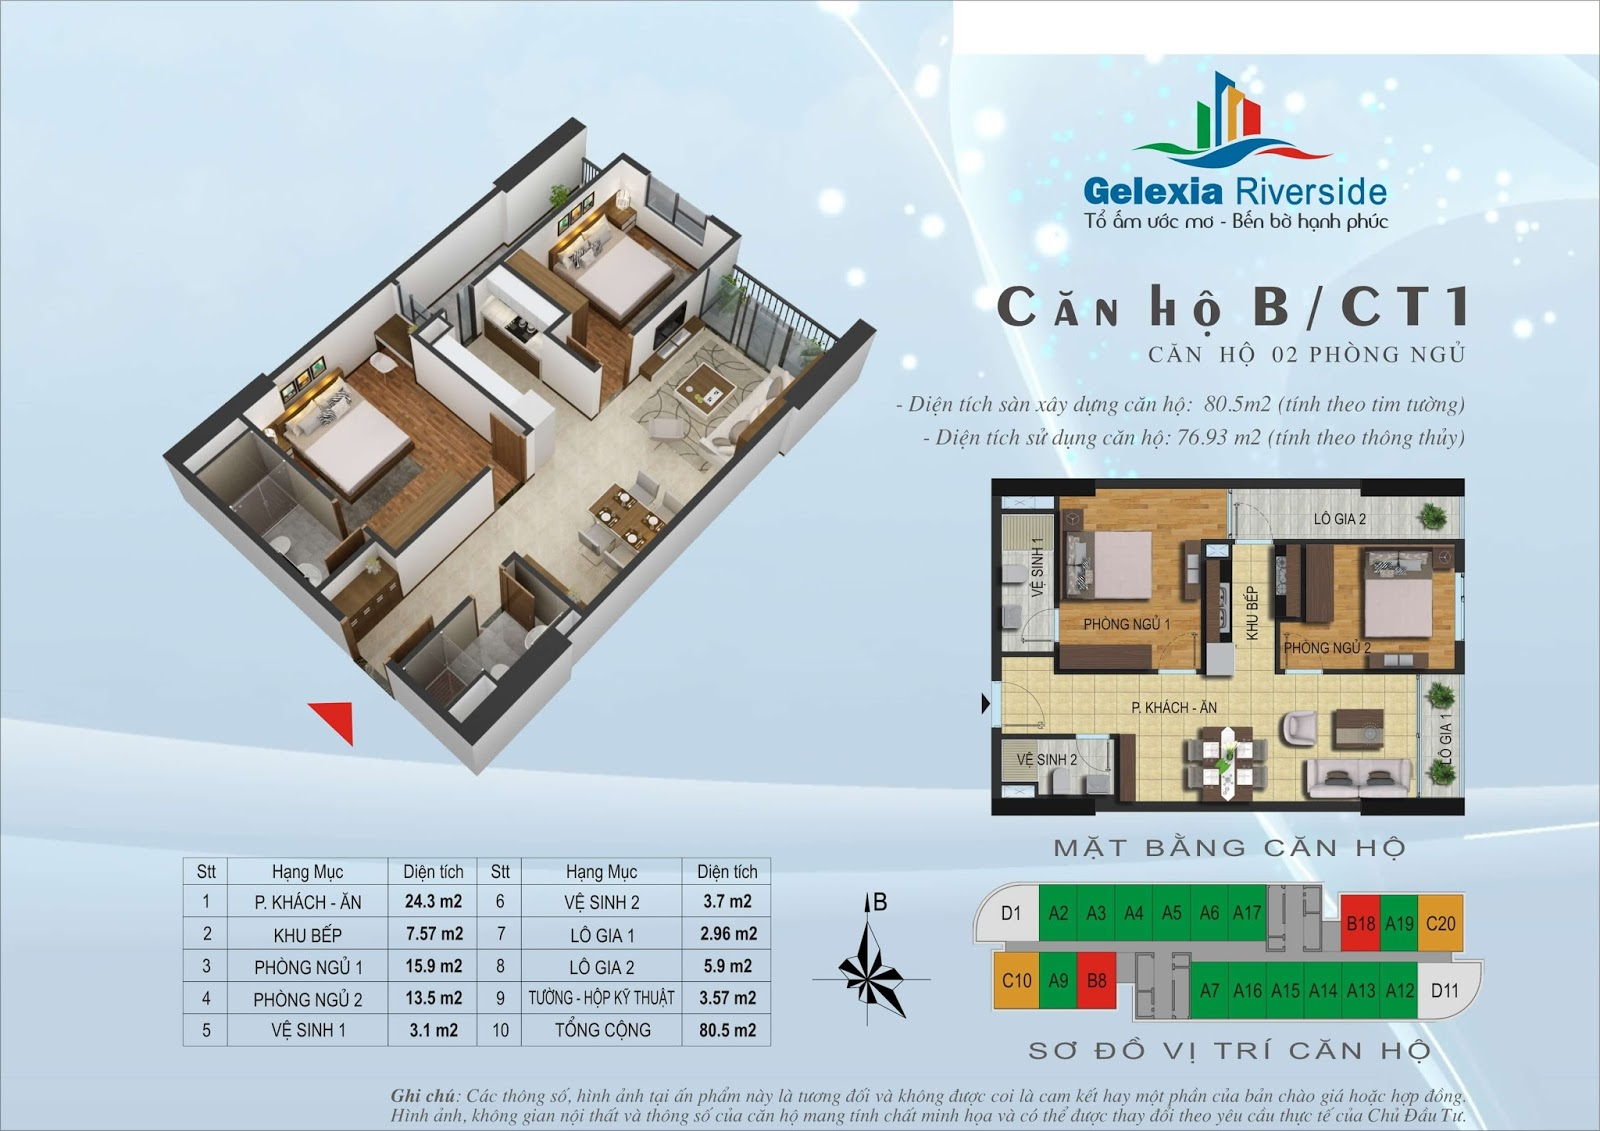 Mặt bằng căn hộ 80,5 m2 tòa CT1 - Gelexia Riverside